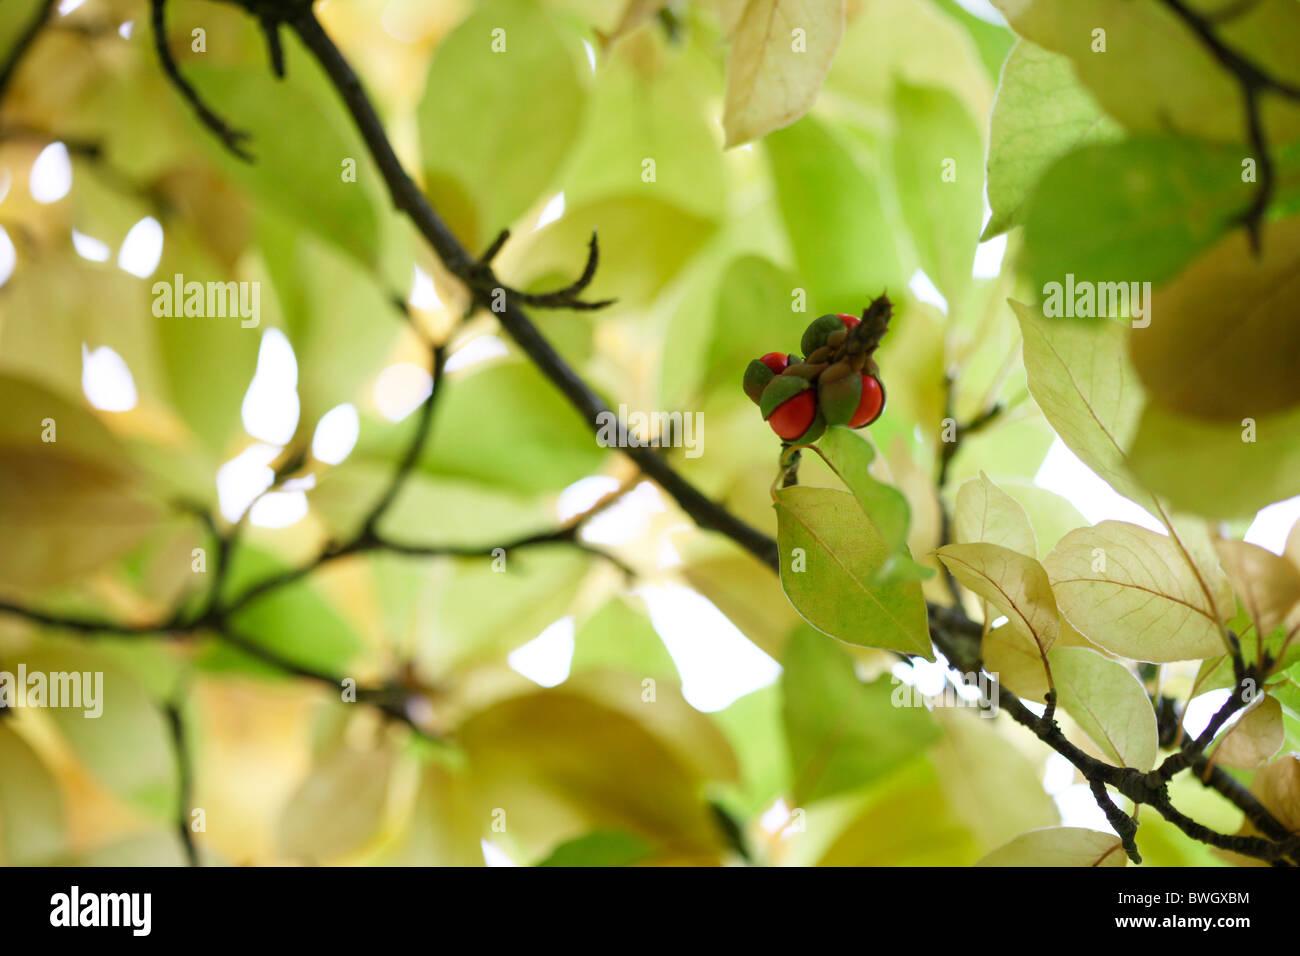 emerging red fruits amongst leafy canopy - fine art photography Jane-Ann Butler Photography JABP947 - Stock Image